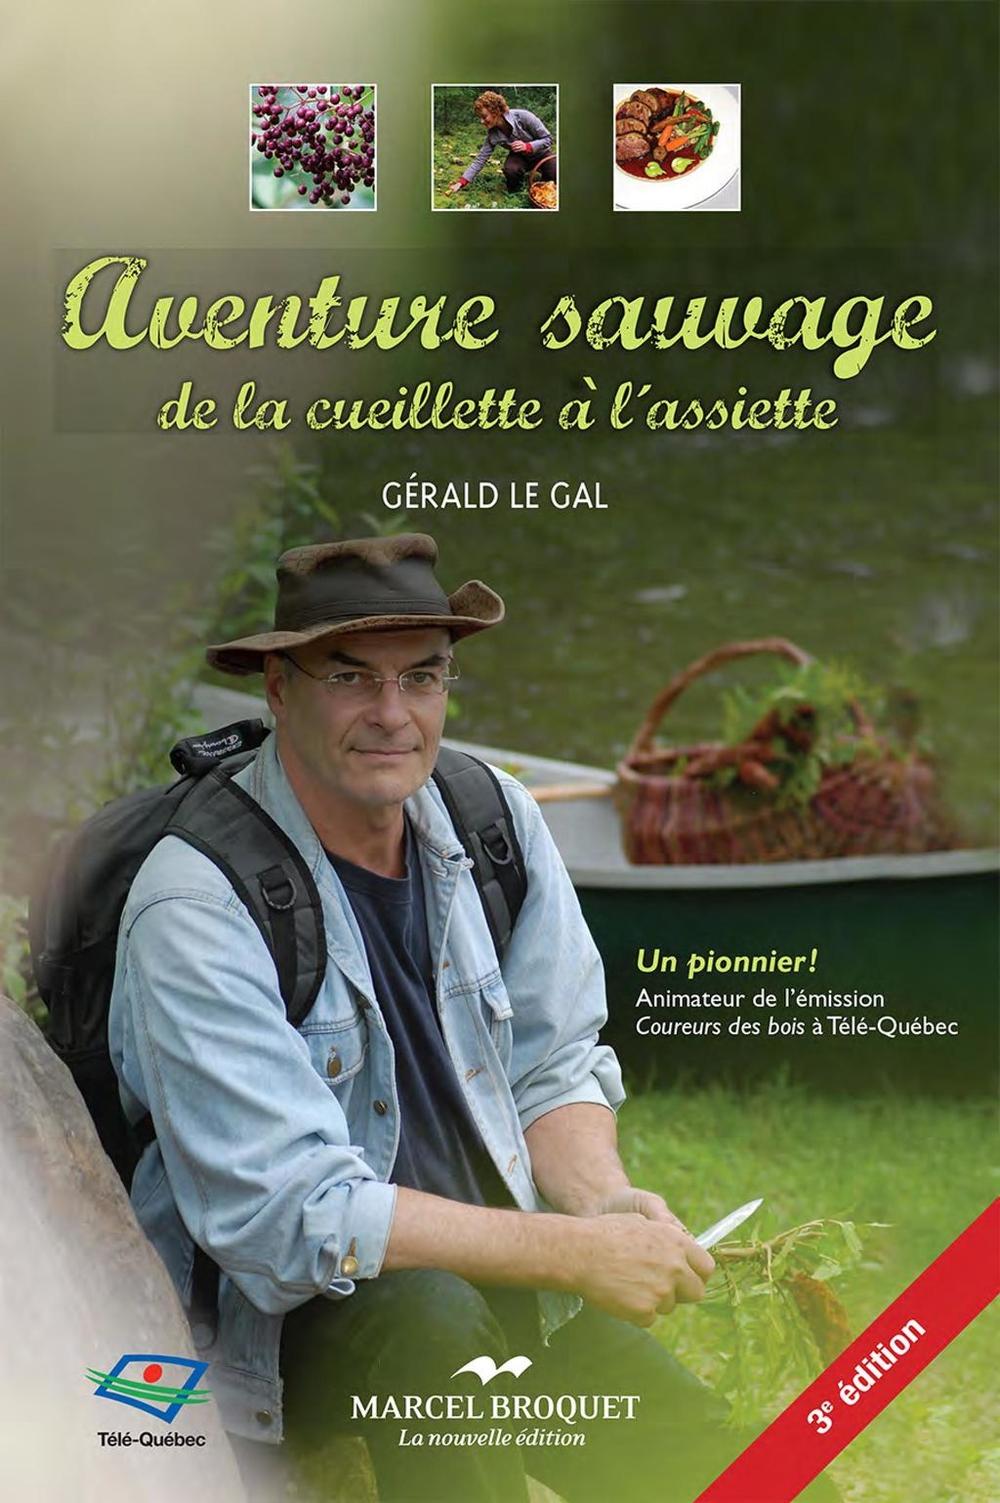 Aventure sauvage 3e édition 2016